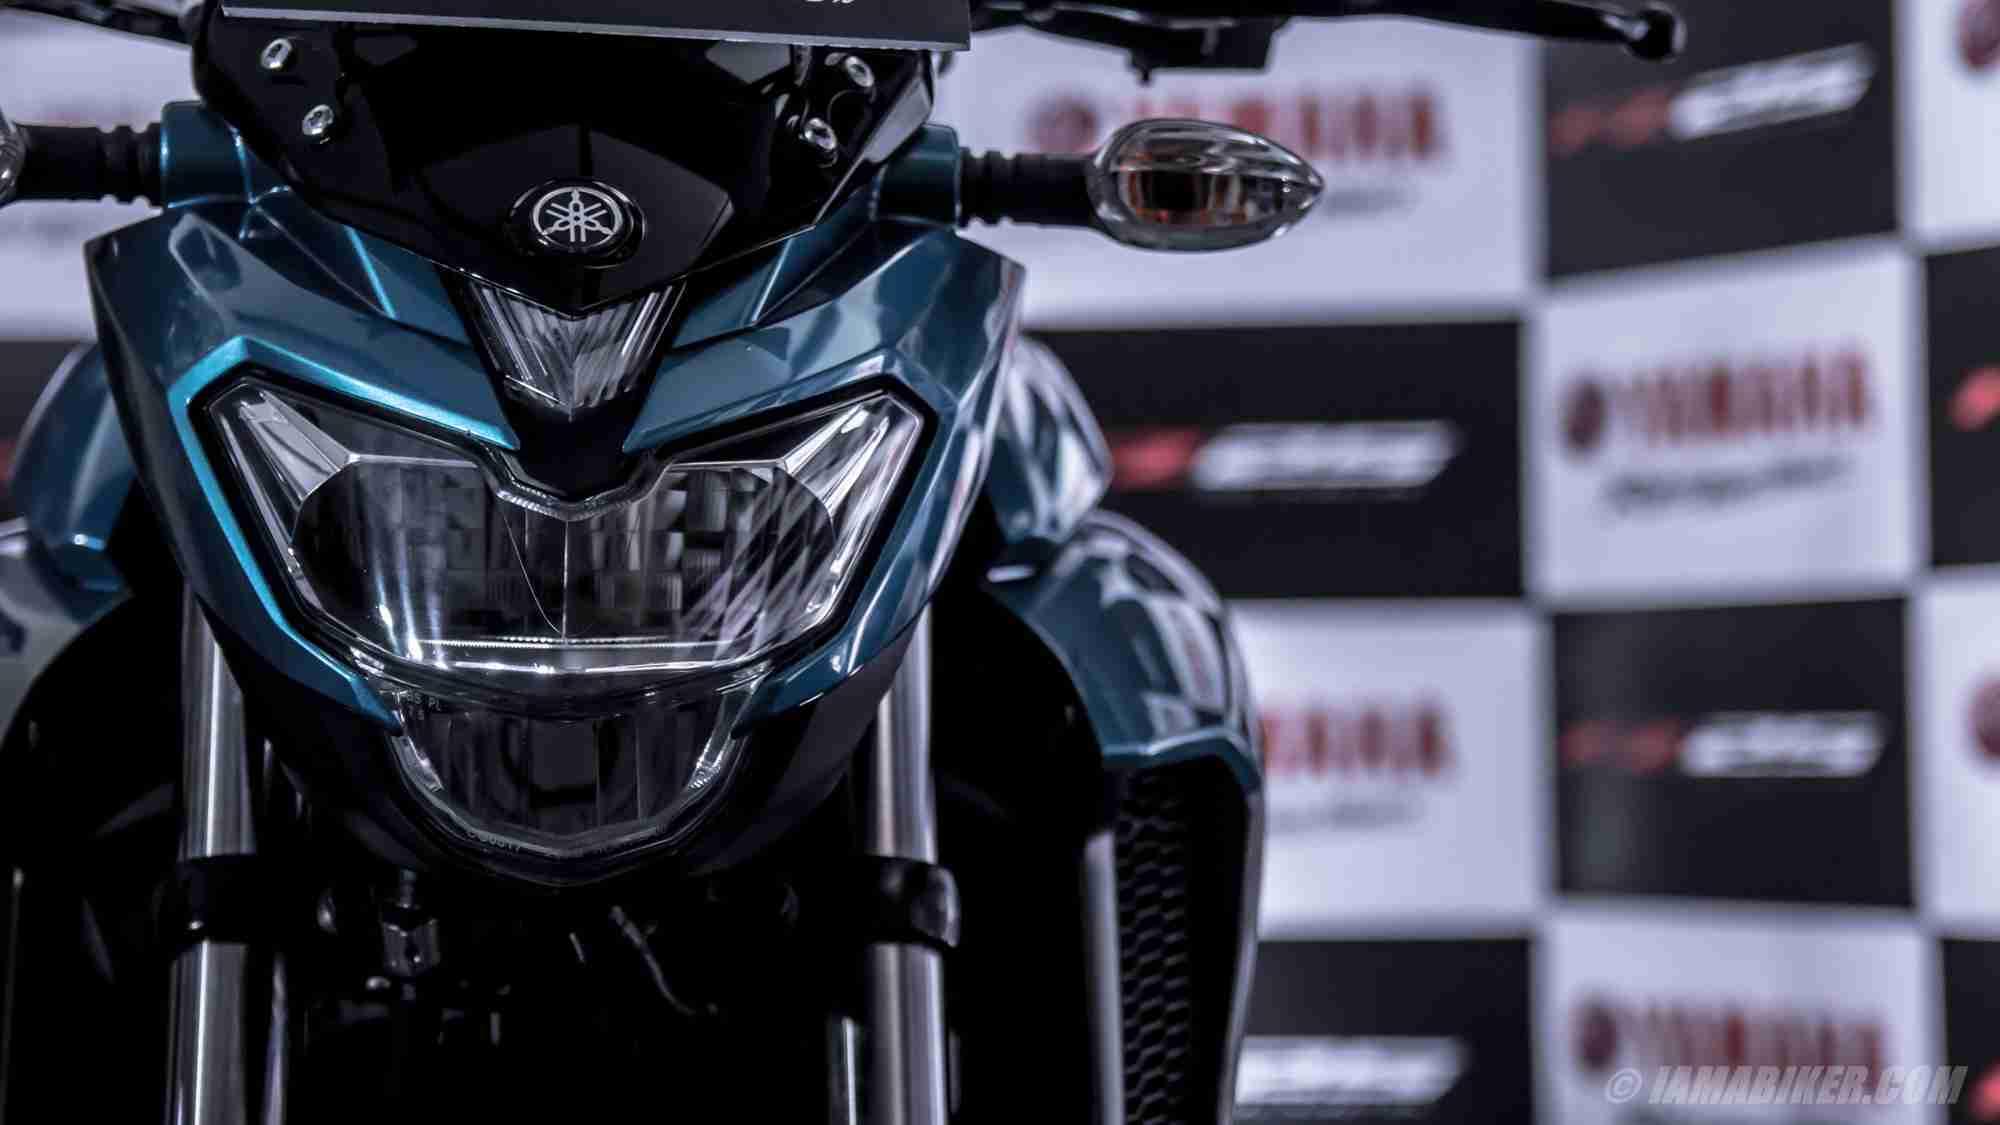 Yamaha FZ25 Image Gallery